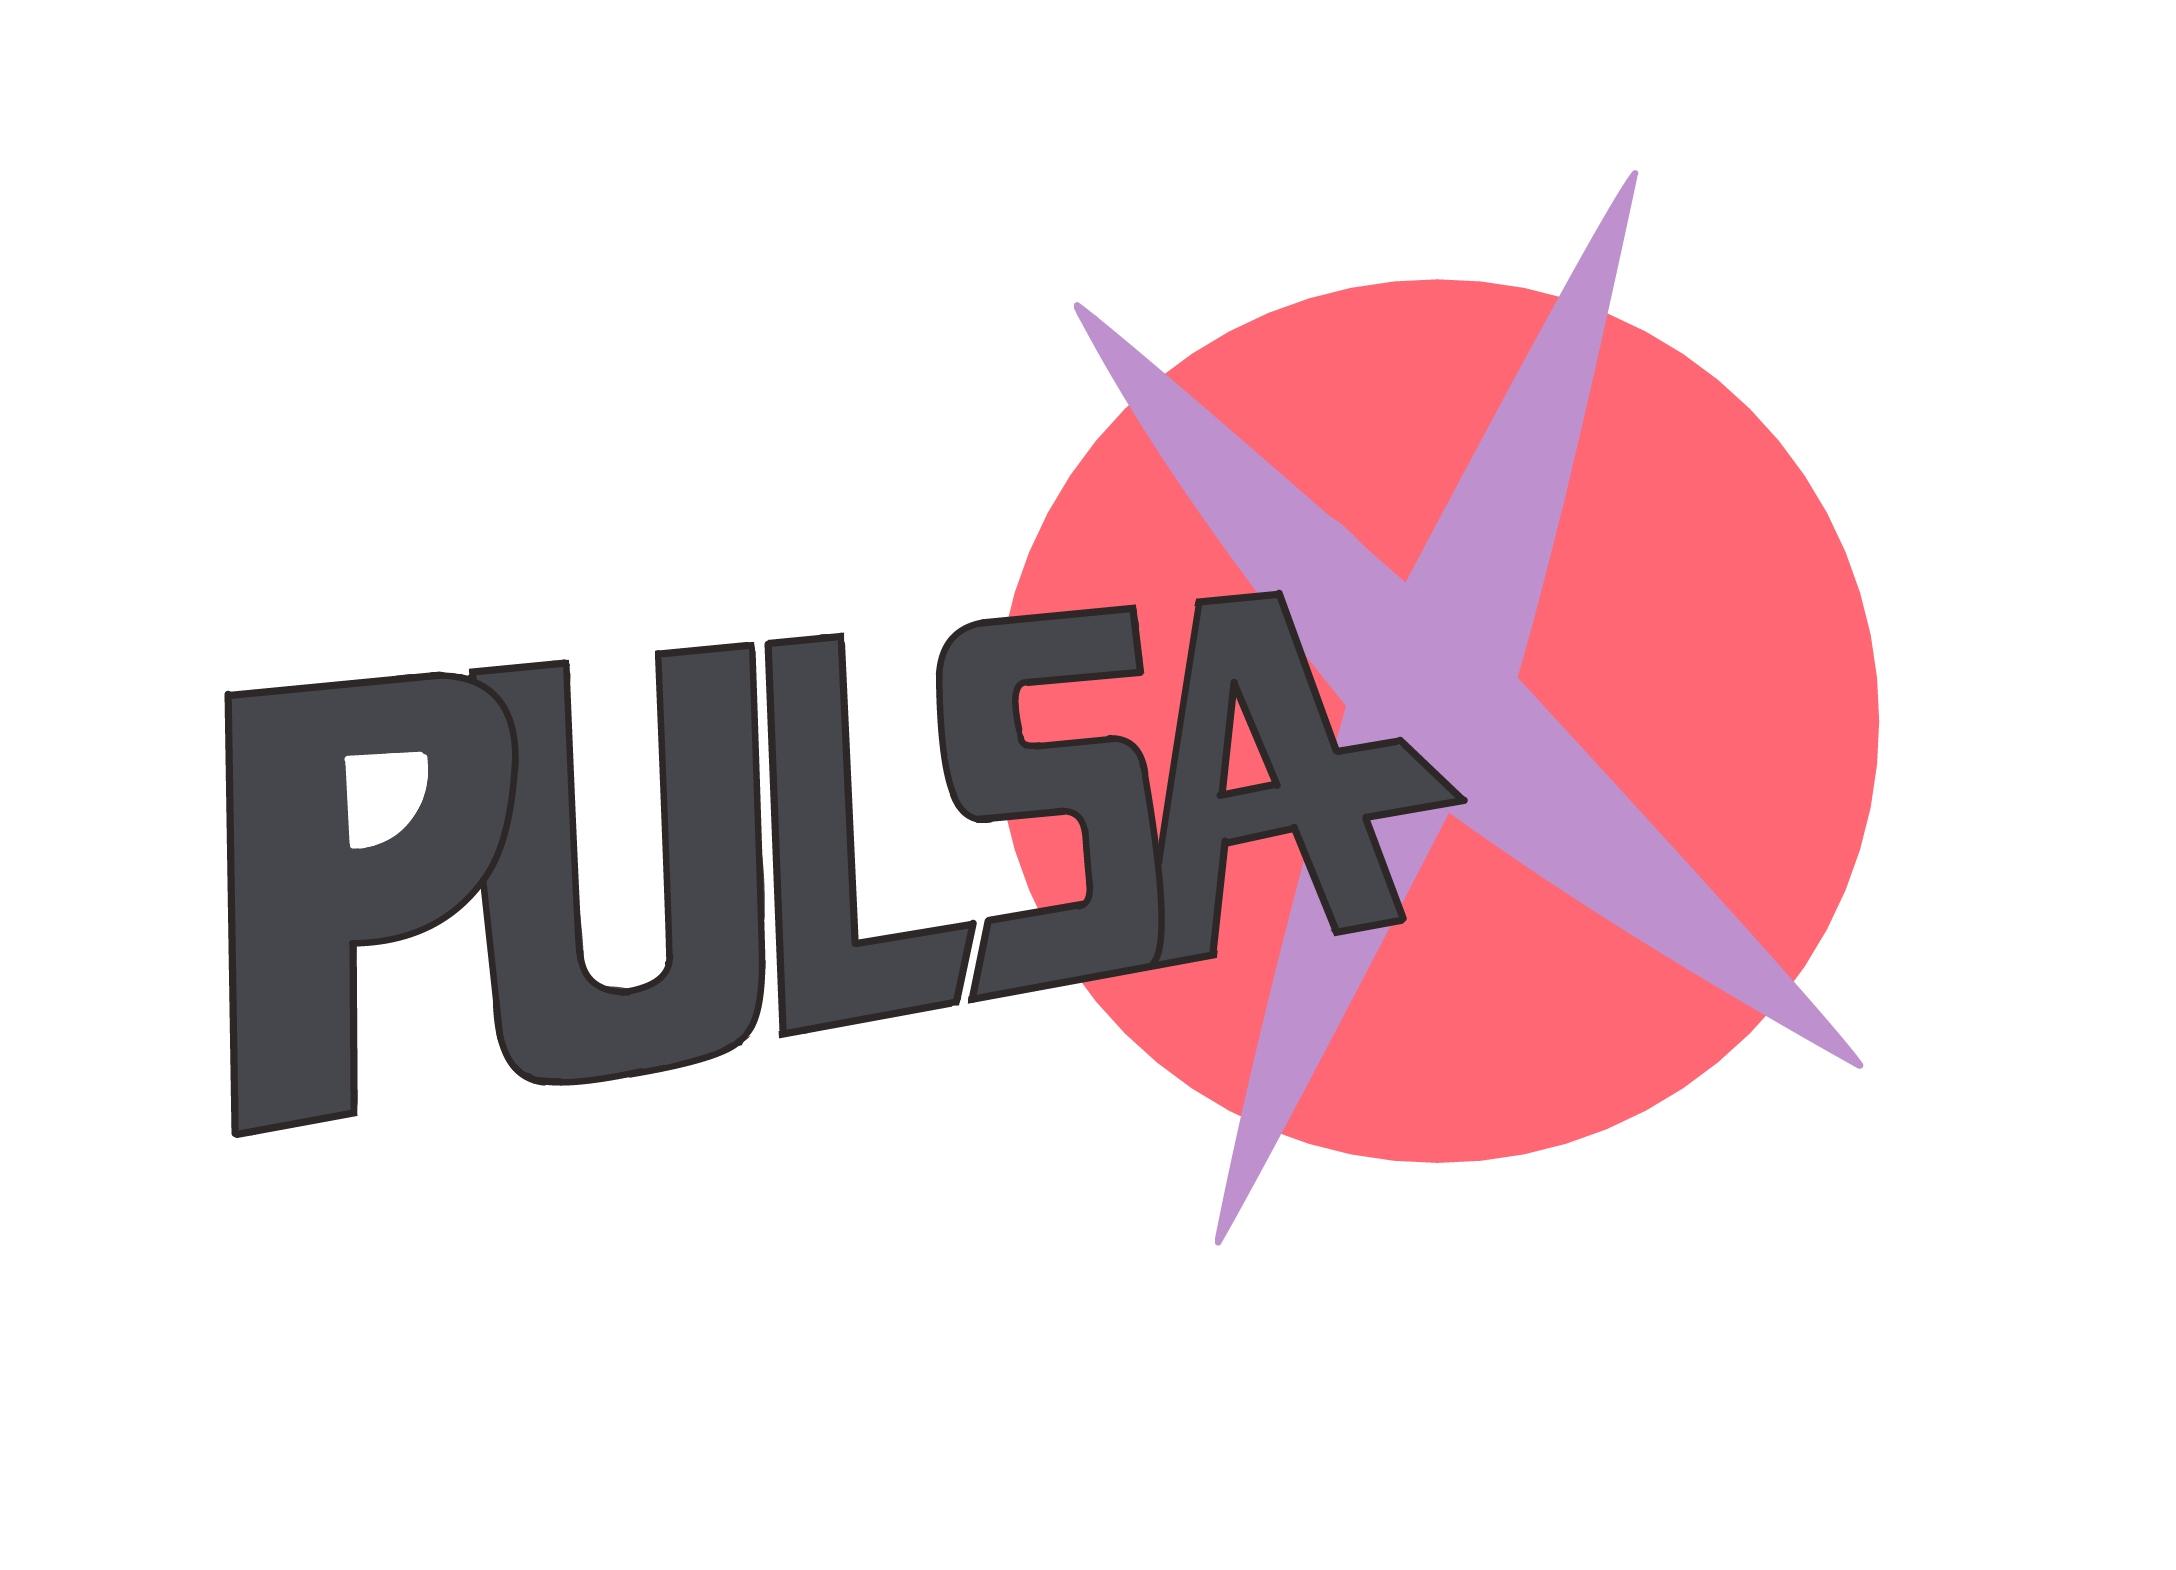 PULSAX-PROGRAMA10c